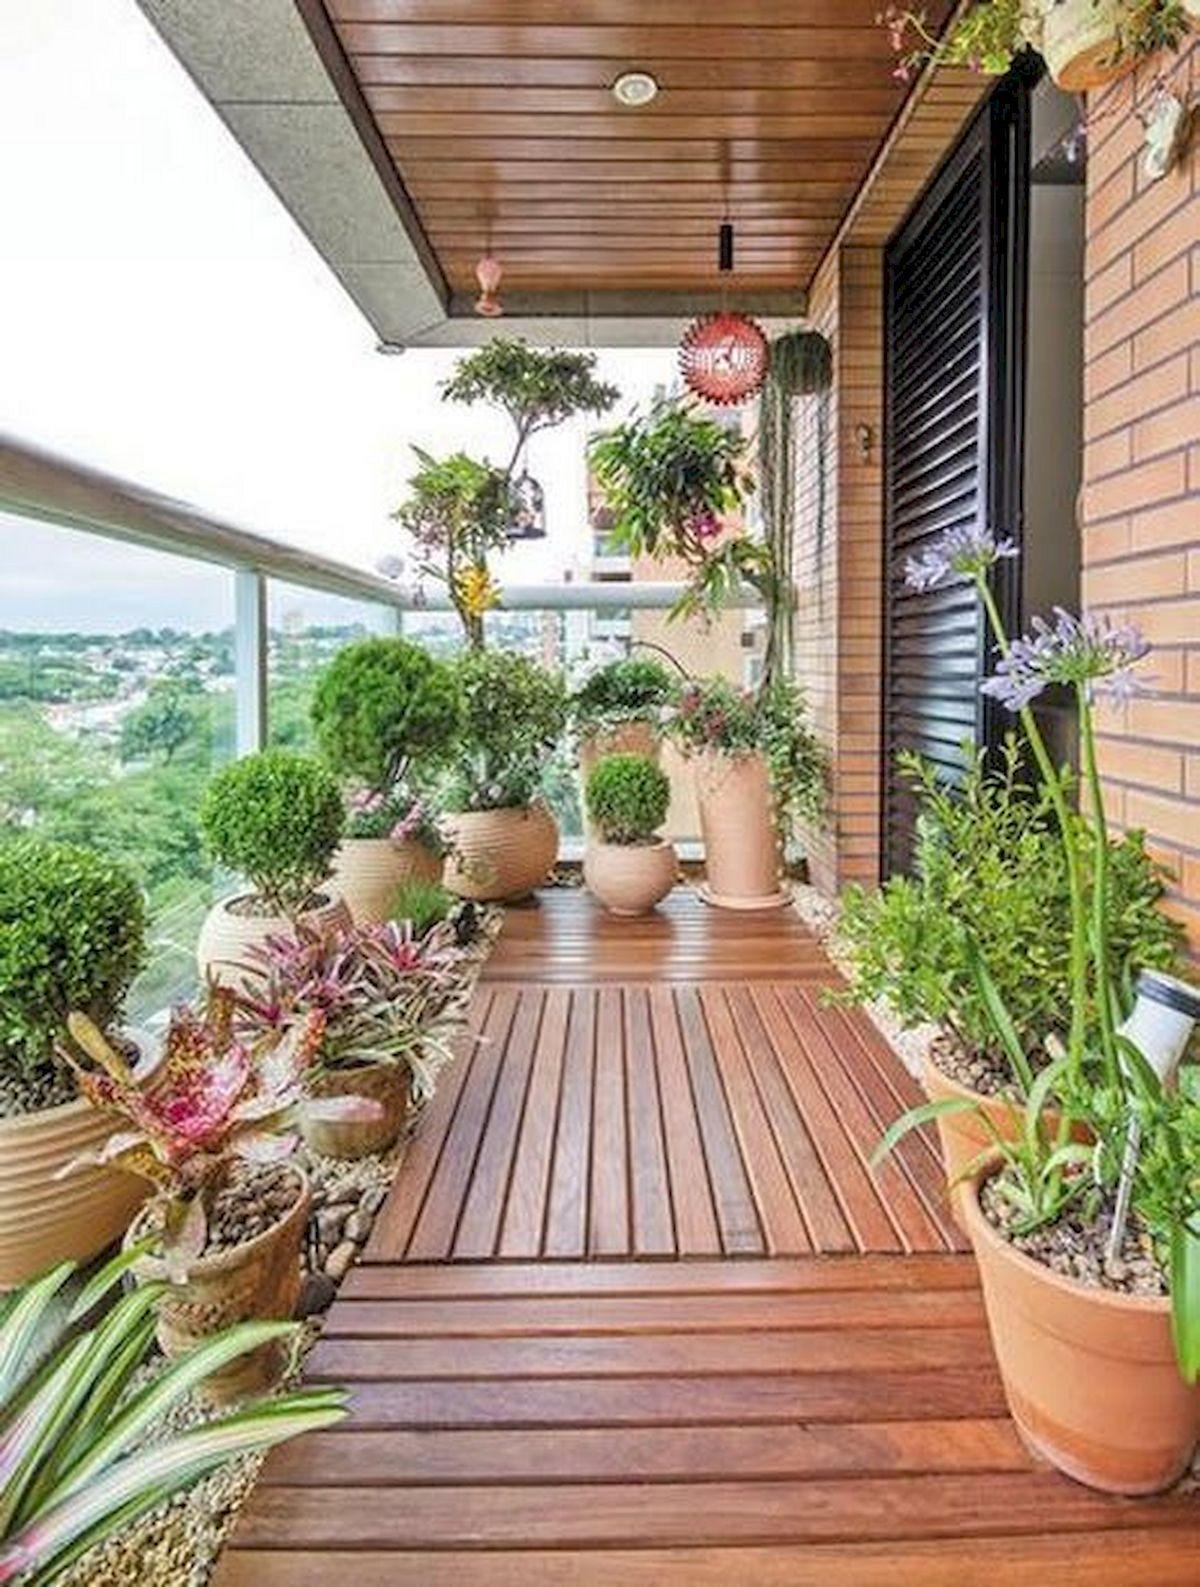 Beautiful DIY Pot And Container Garden